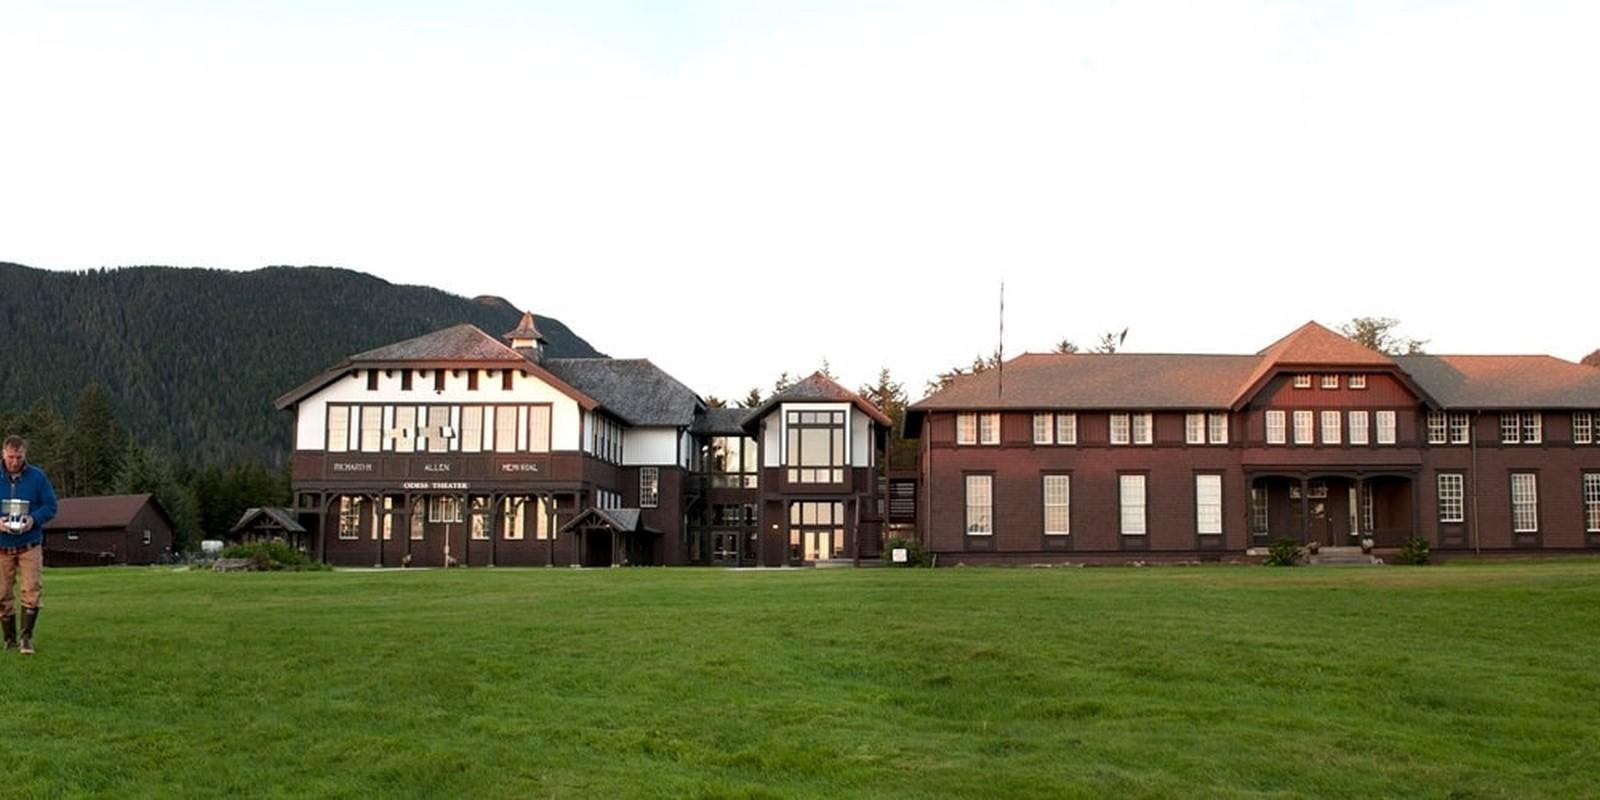 Sheldon Jackson College, Sitka - Sheet3